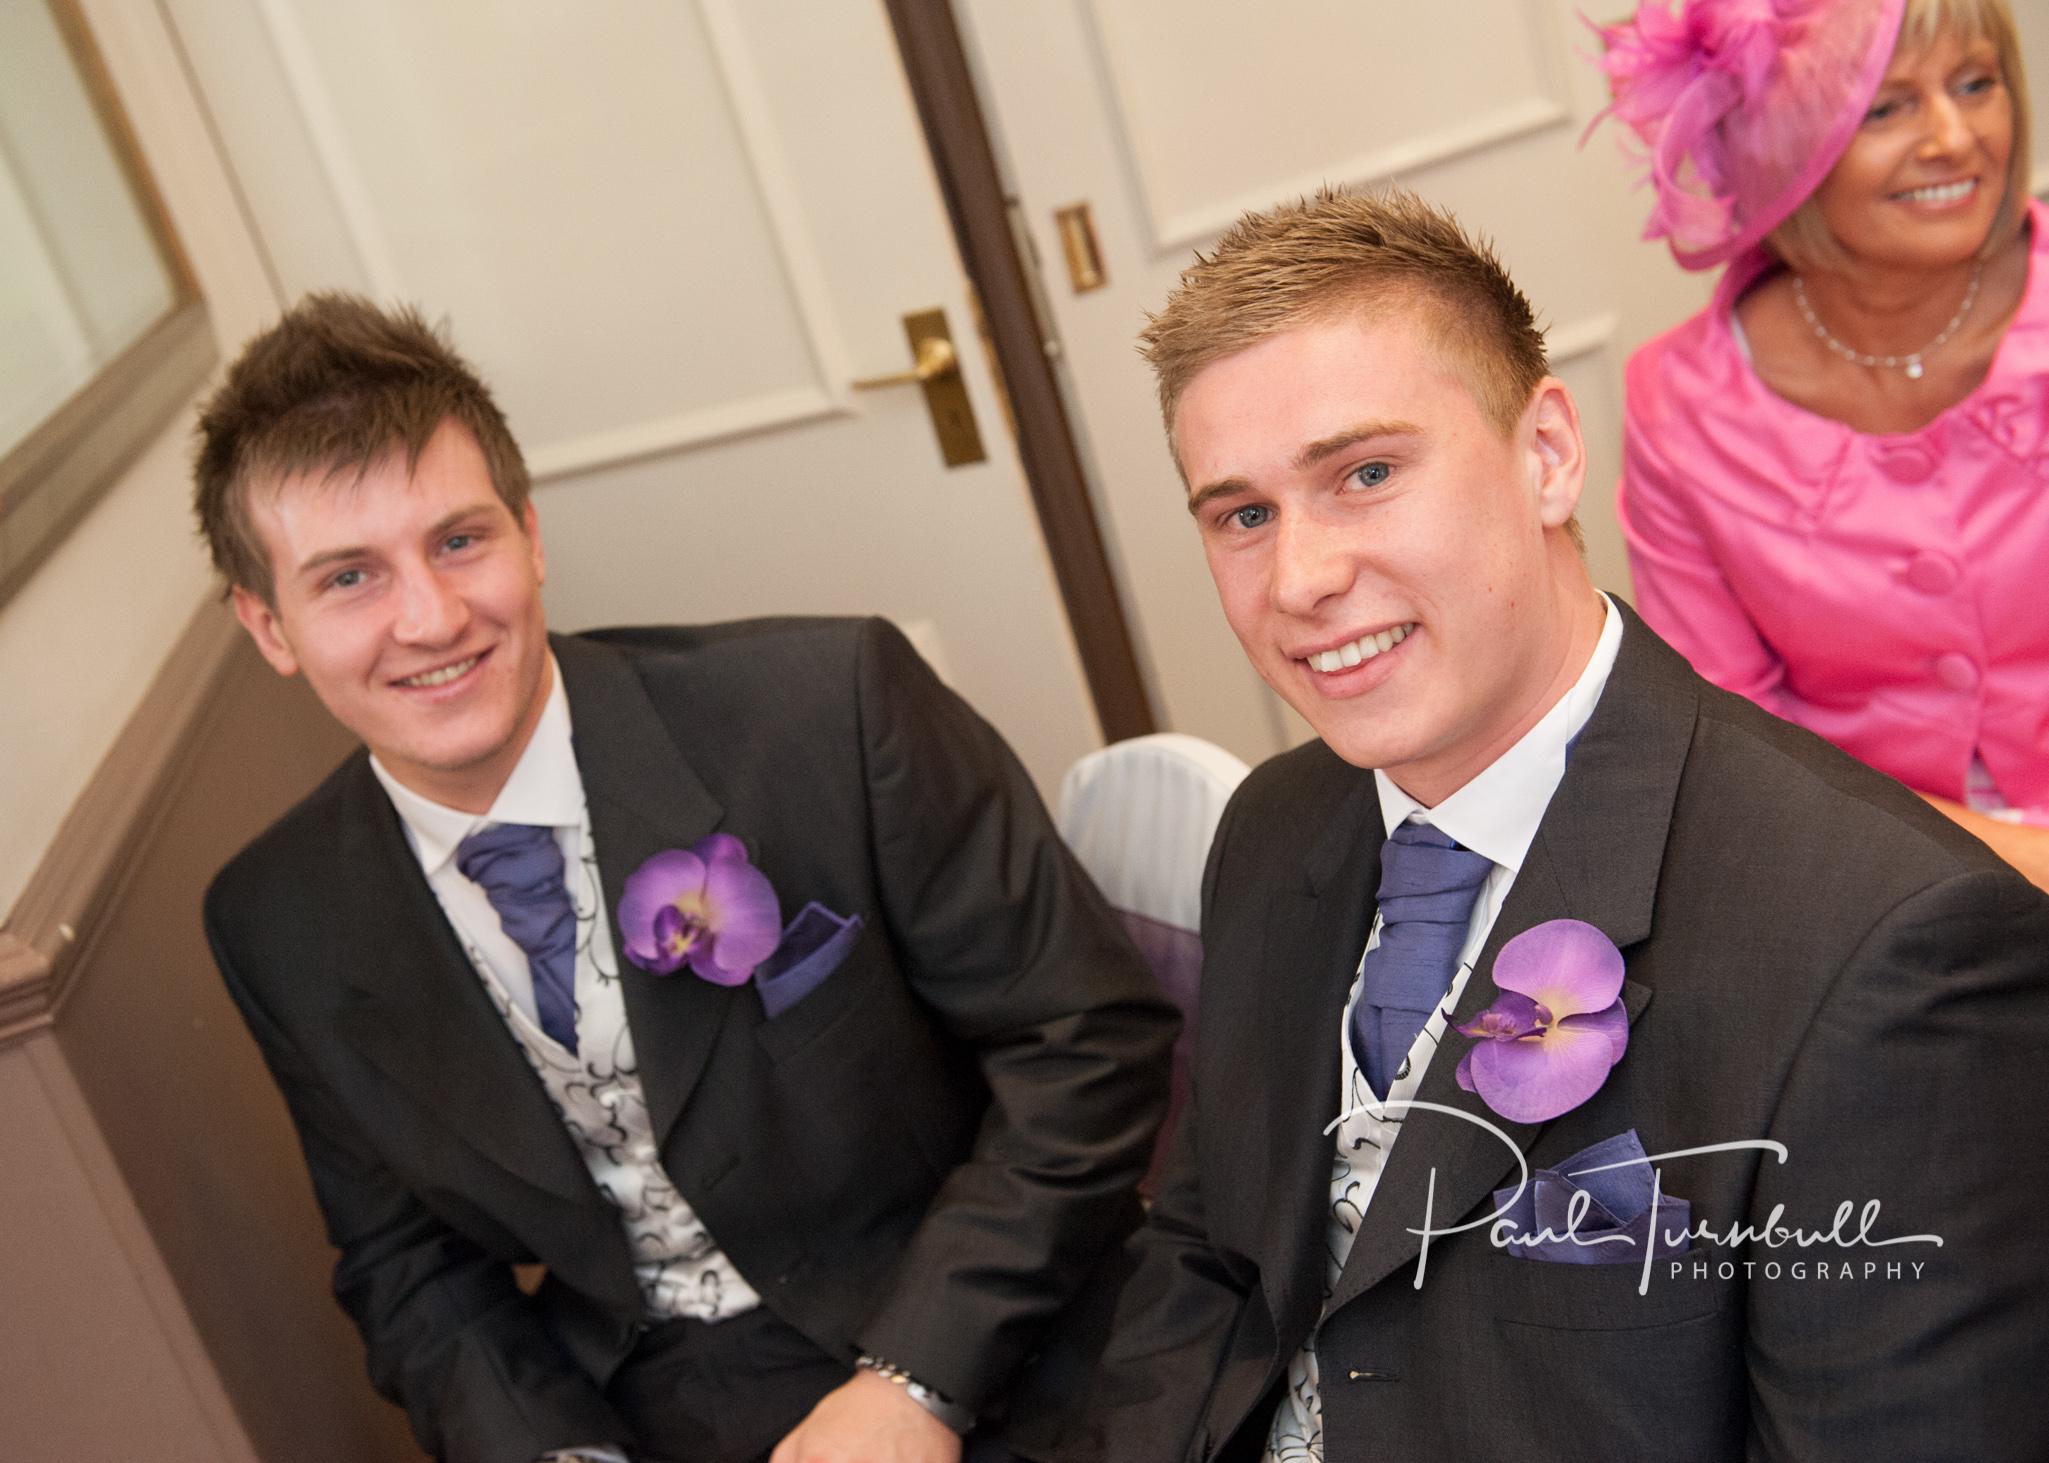 wedding-photography-healds-hall-liversedge-yorkshire-046.jpg